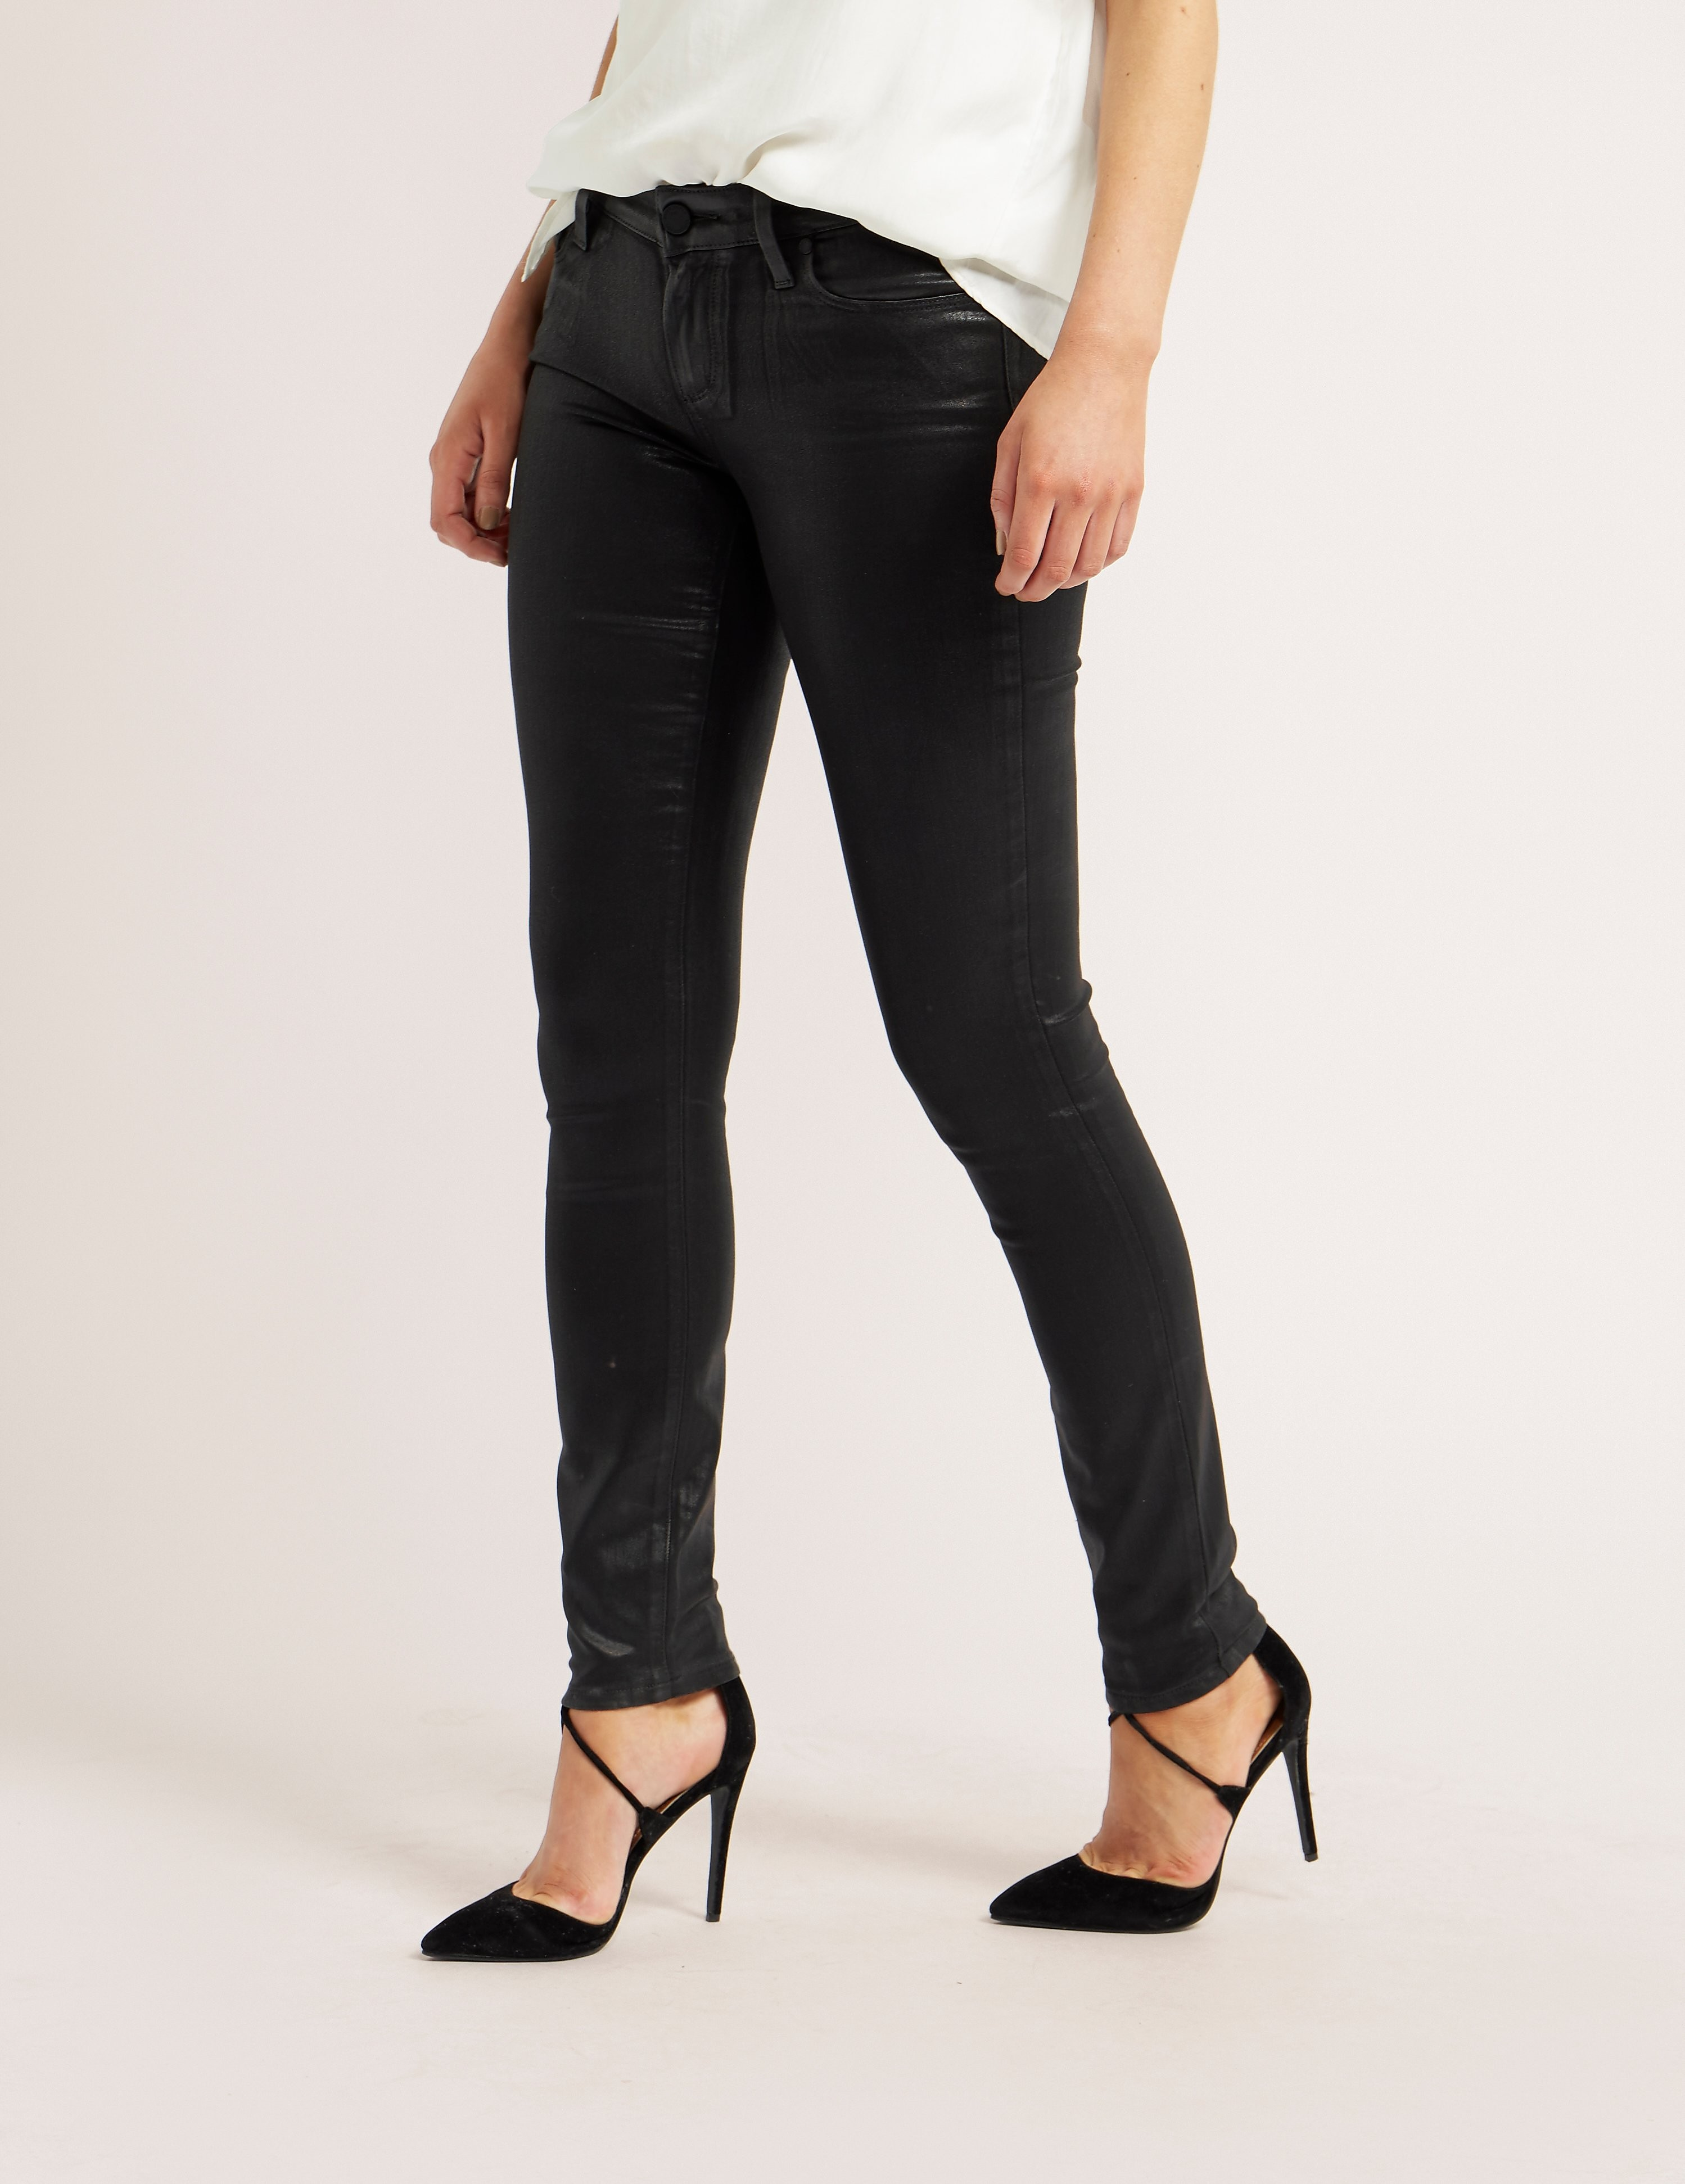 PAIGE Verdugo Coated Skinny Jeans